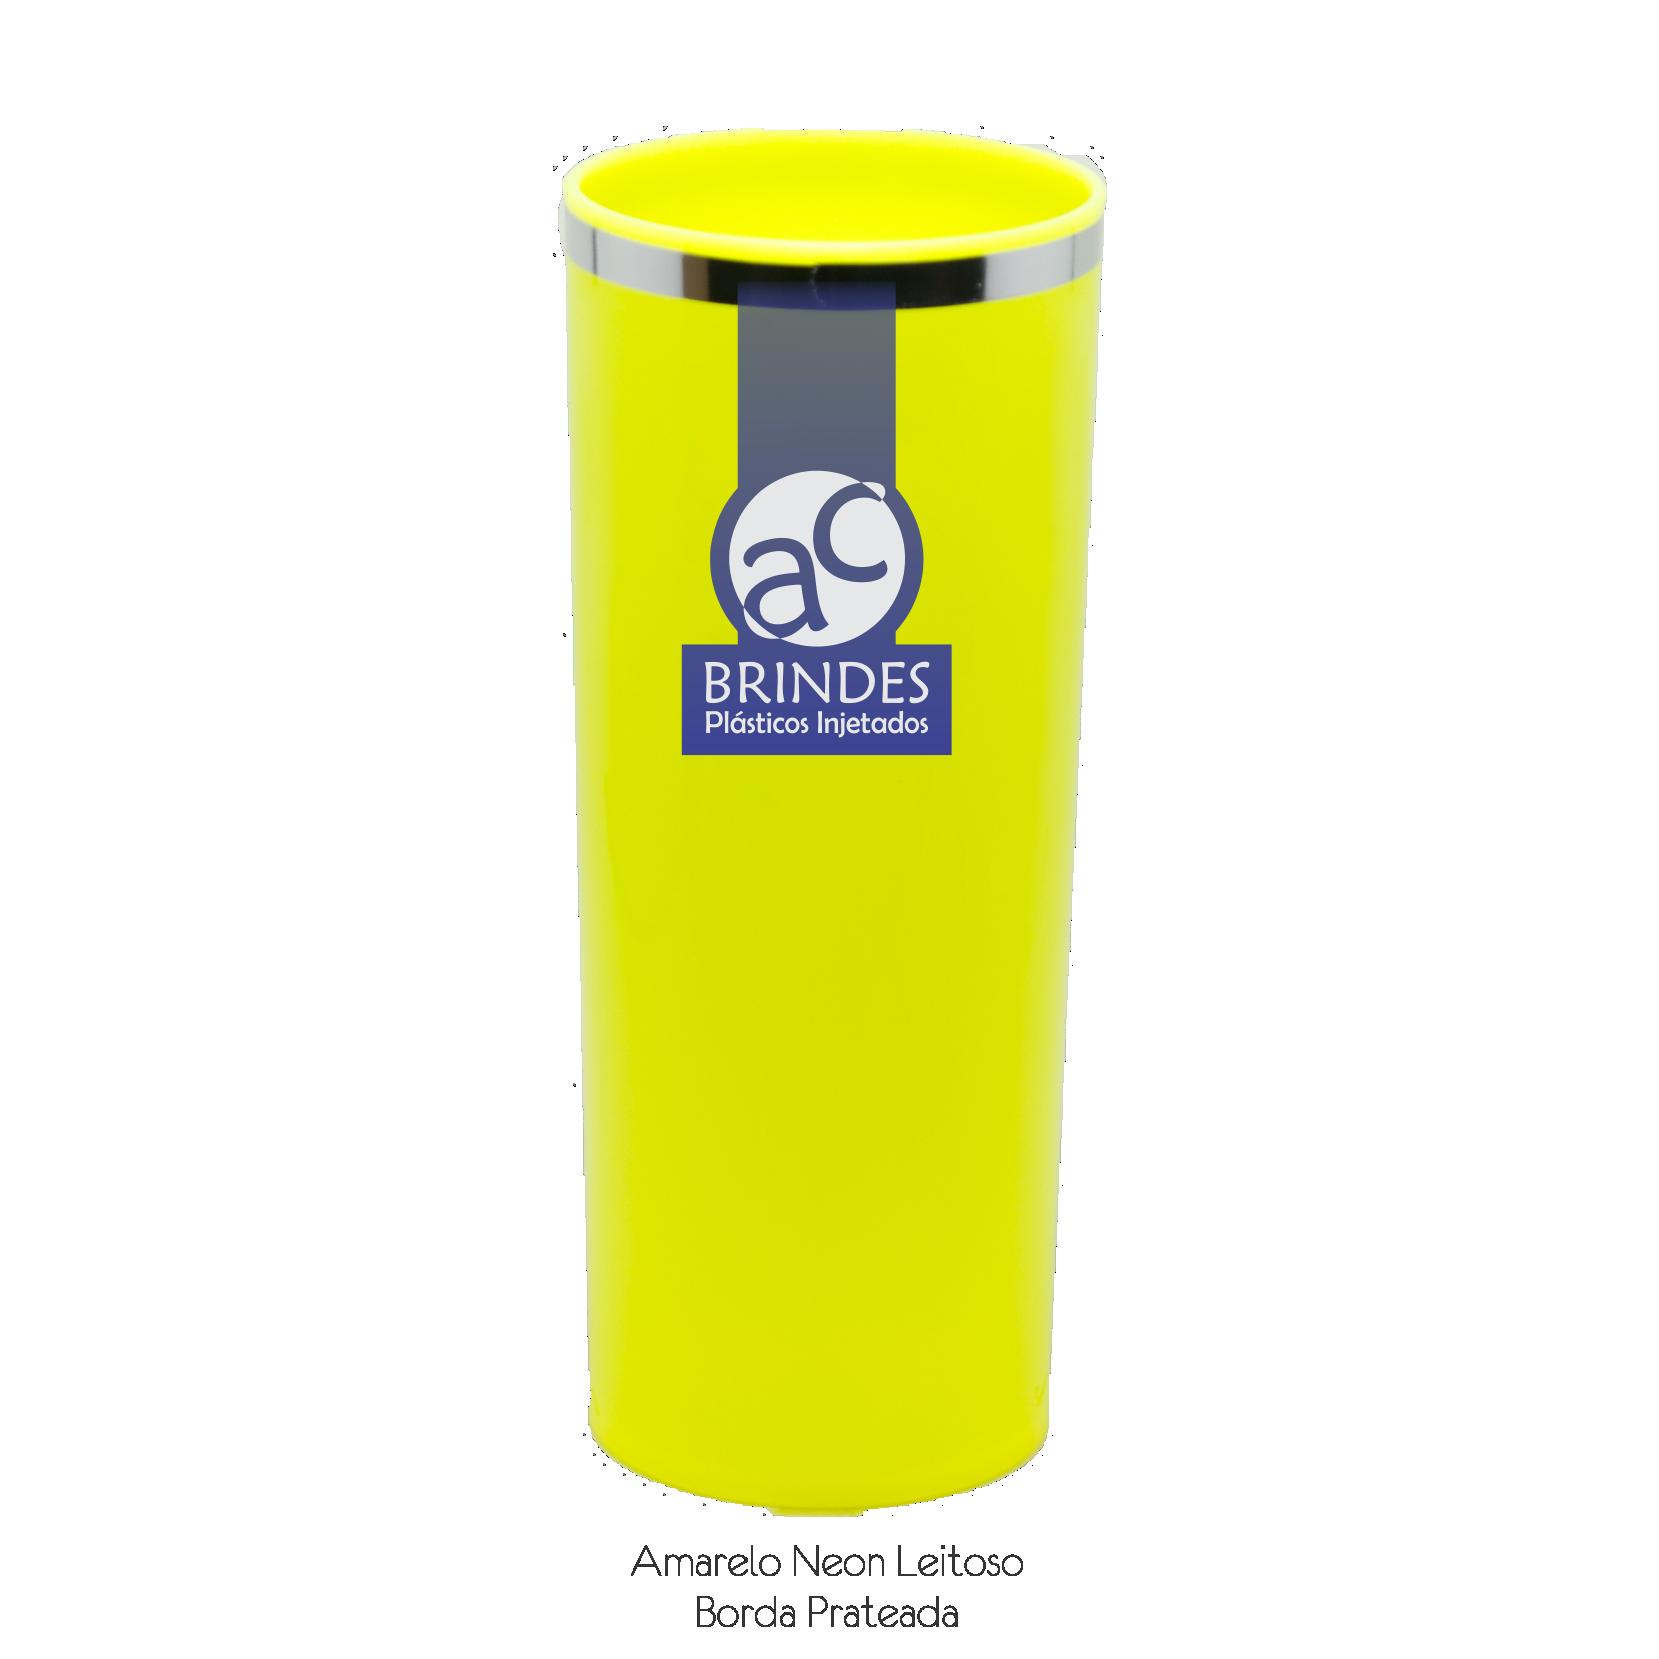 Amarelo Neon Leitoso Borda Prateada